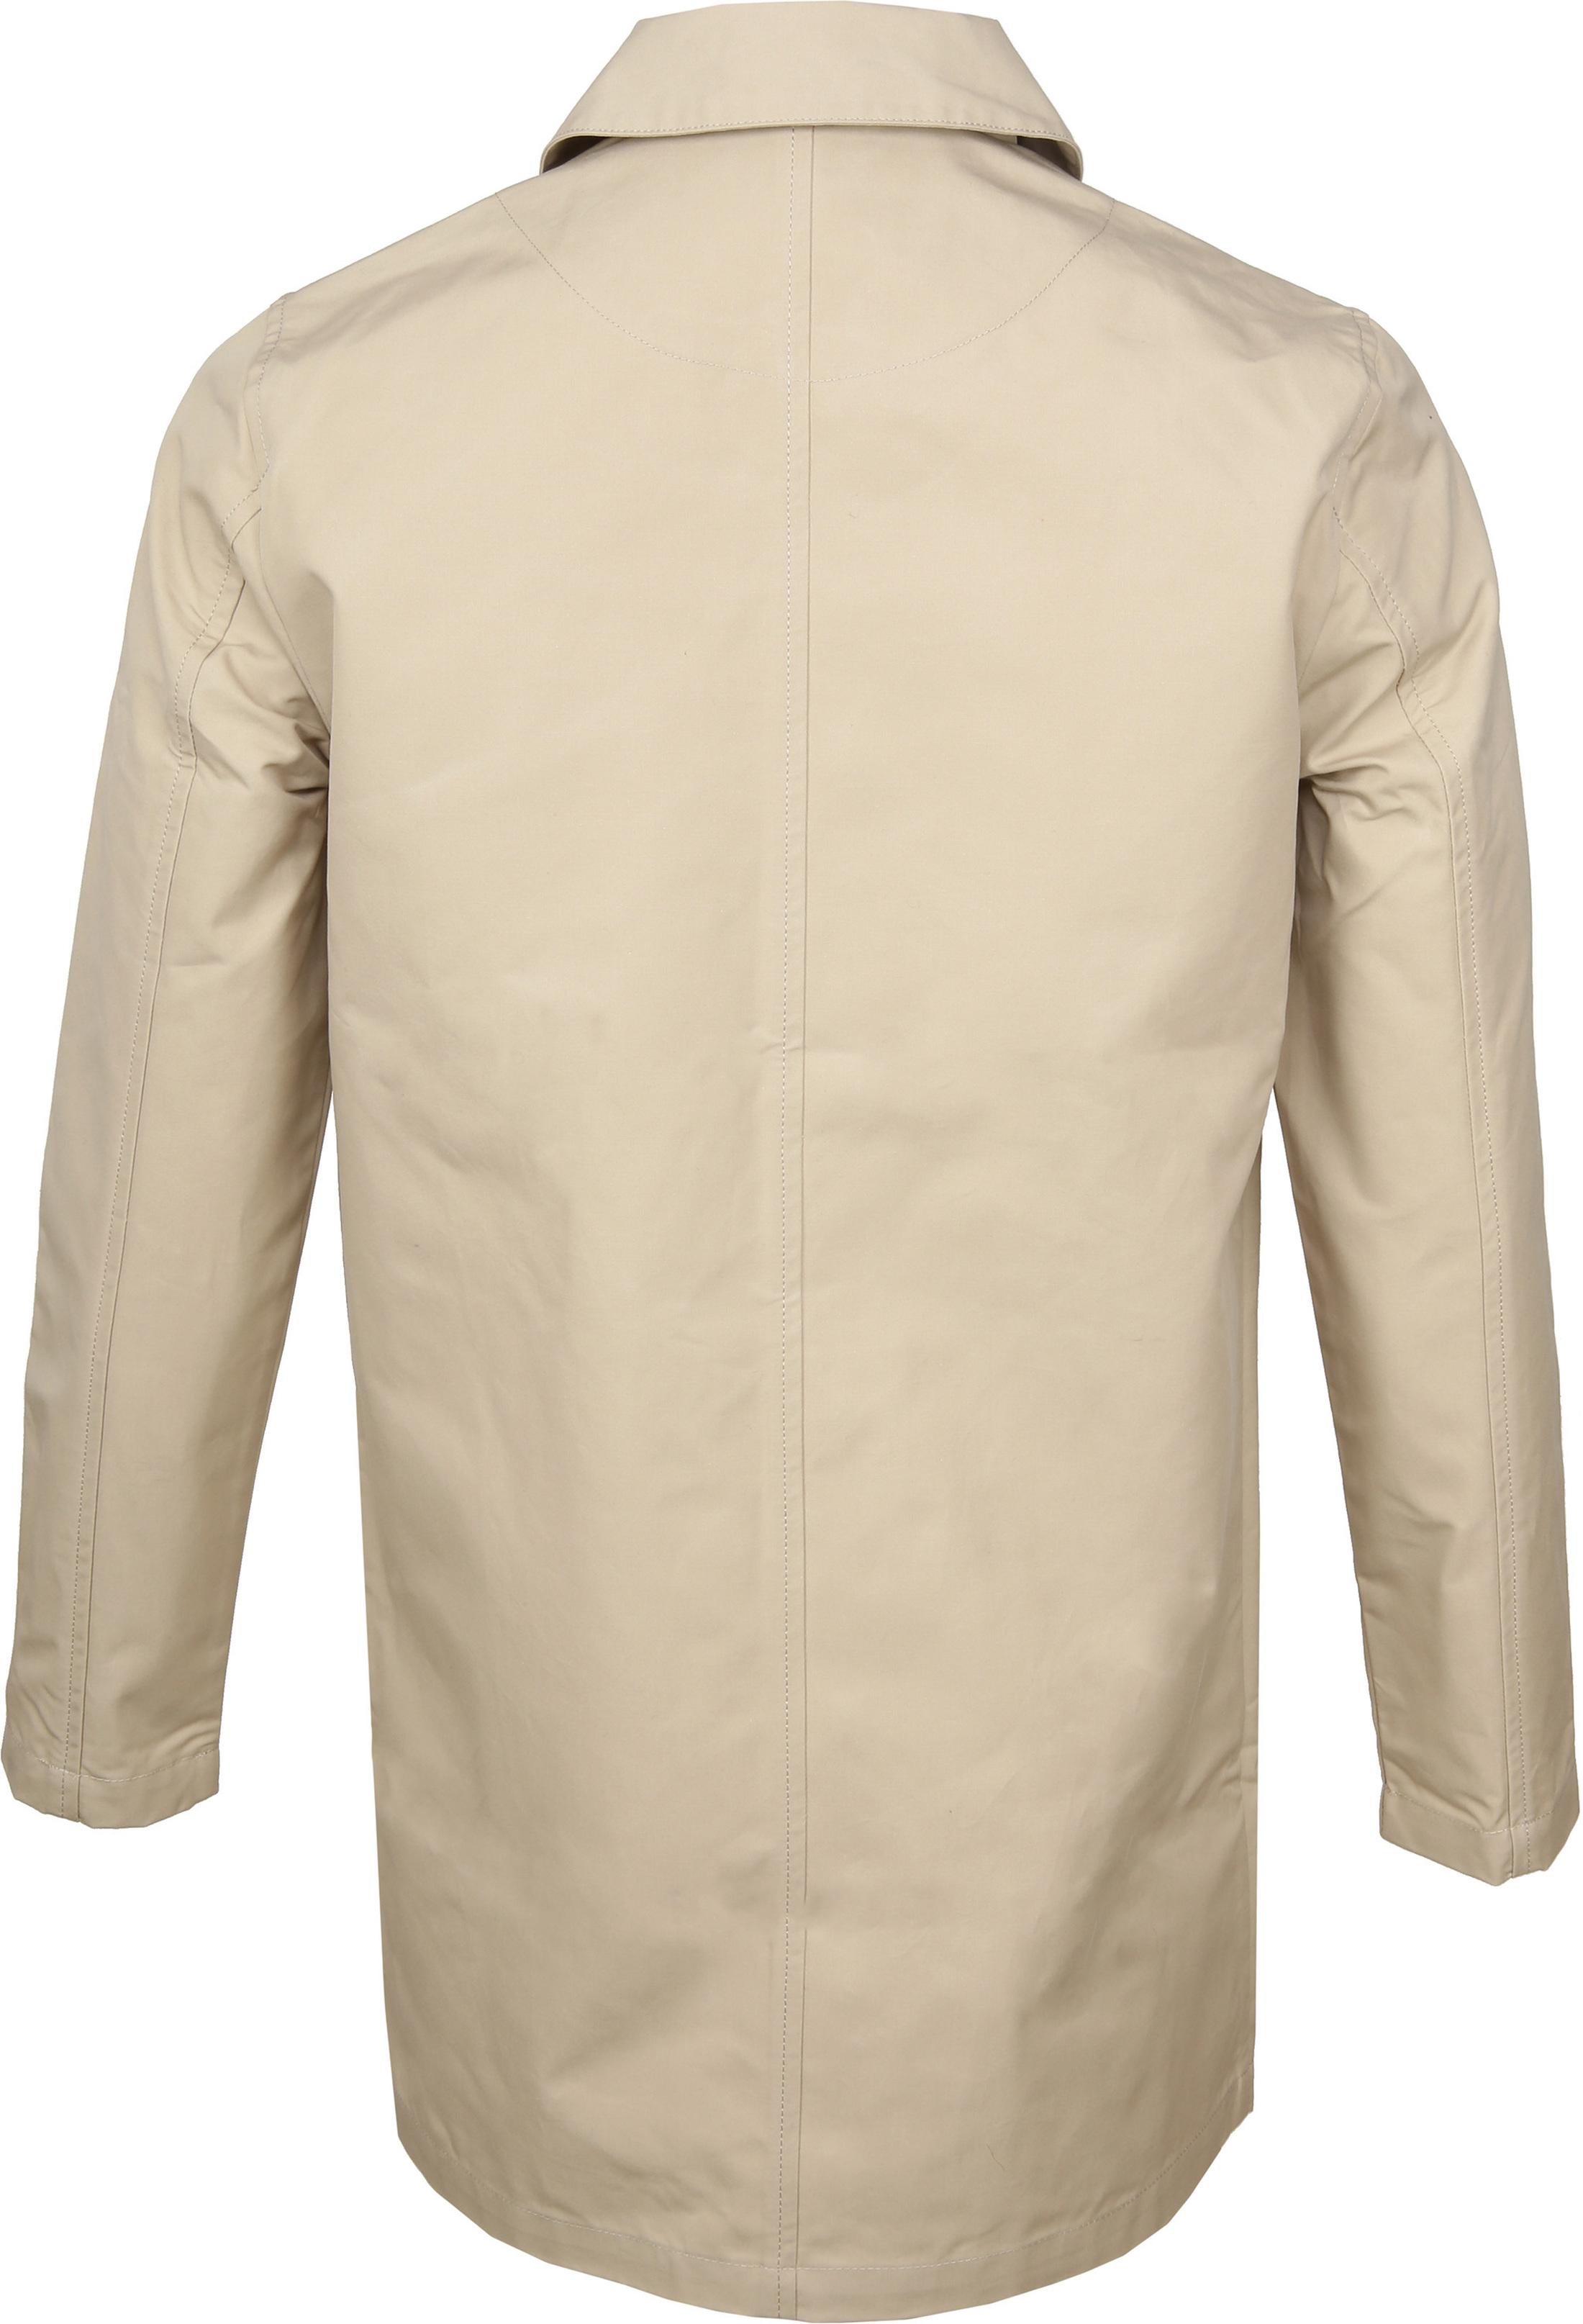 Knowledge Cotton Apparel Carcoat Beige foto 5